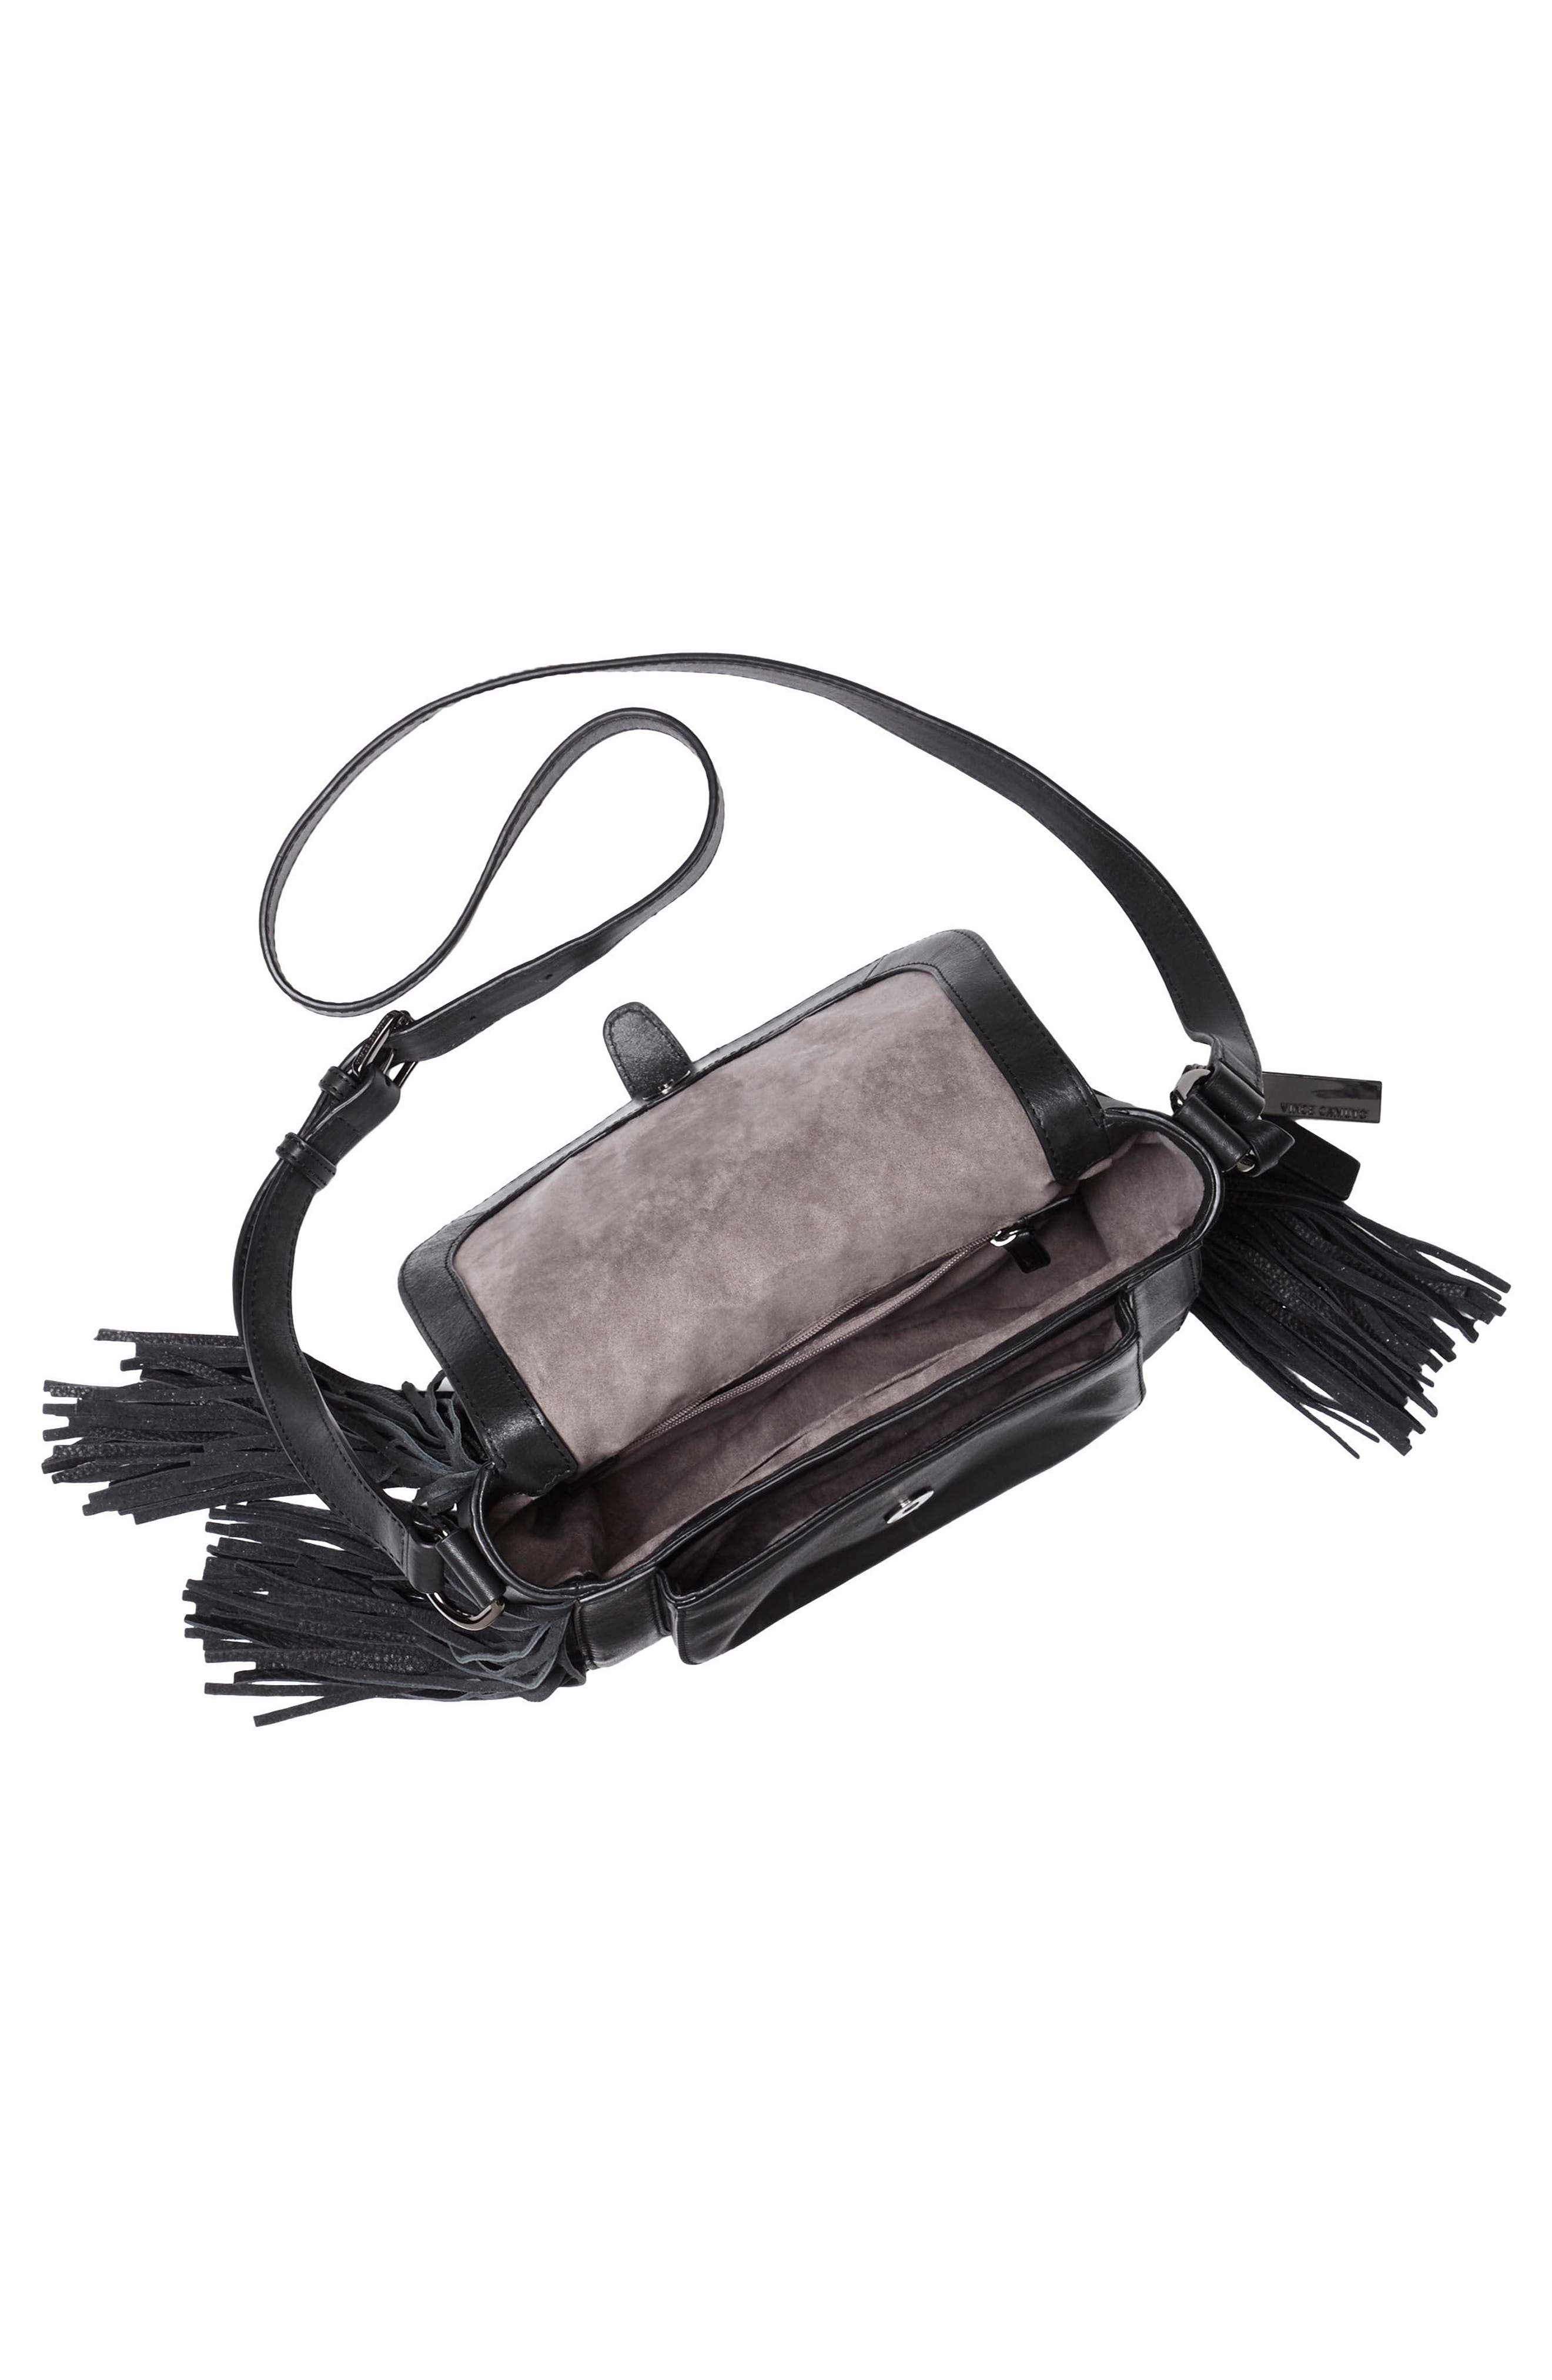 Hil Leather Crossbody Bag,                             Alternate thumbnail 3, color,                             002